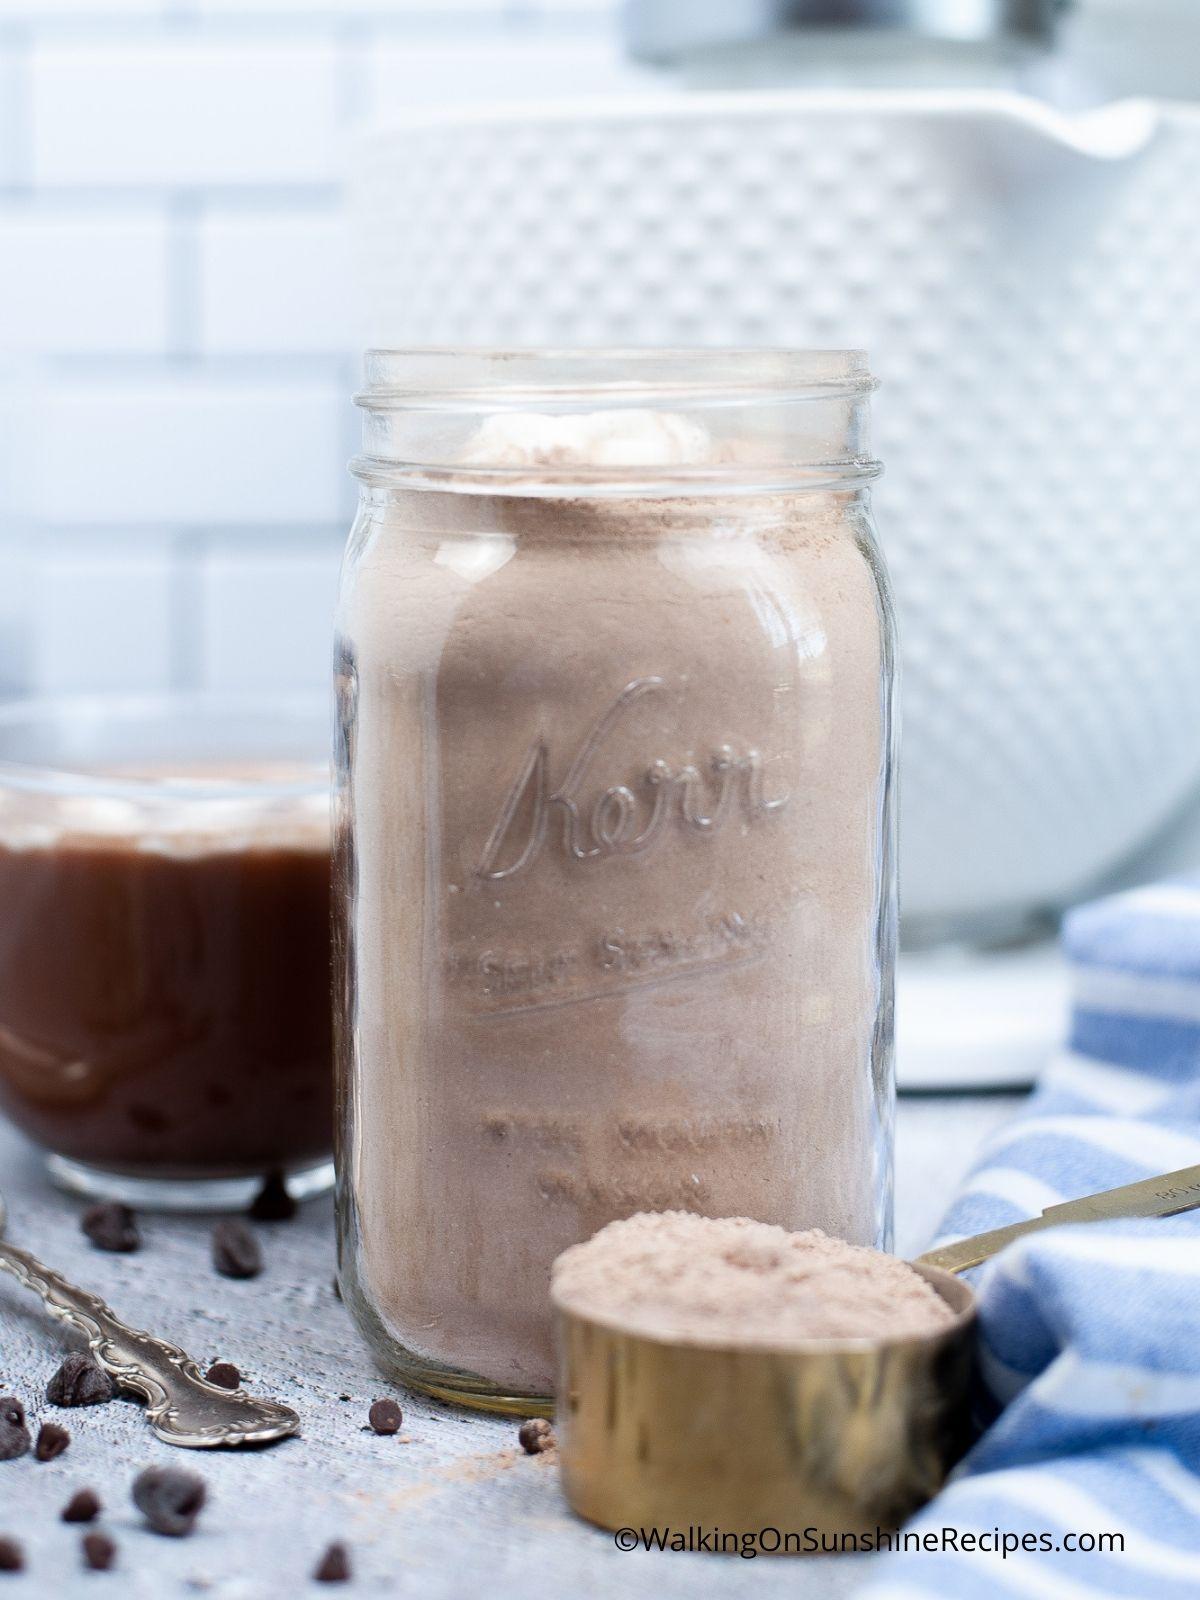 Add ingredients to mason jar.